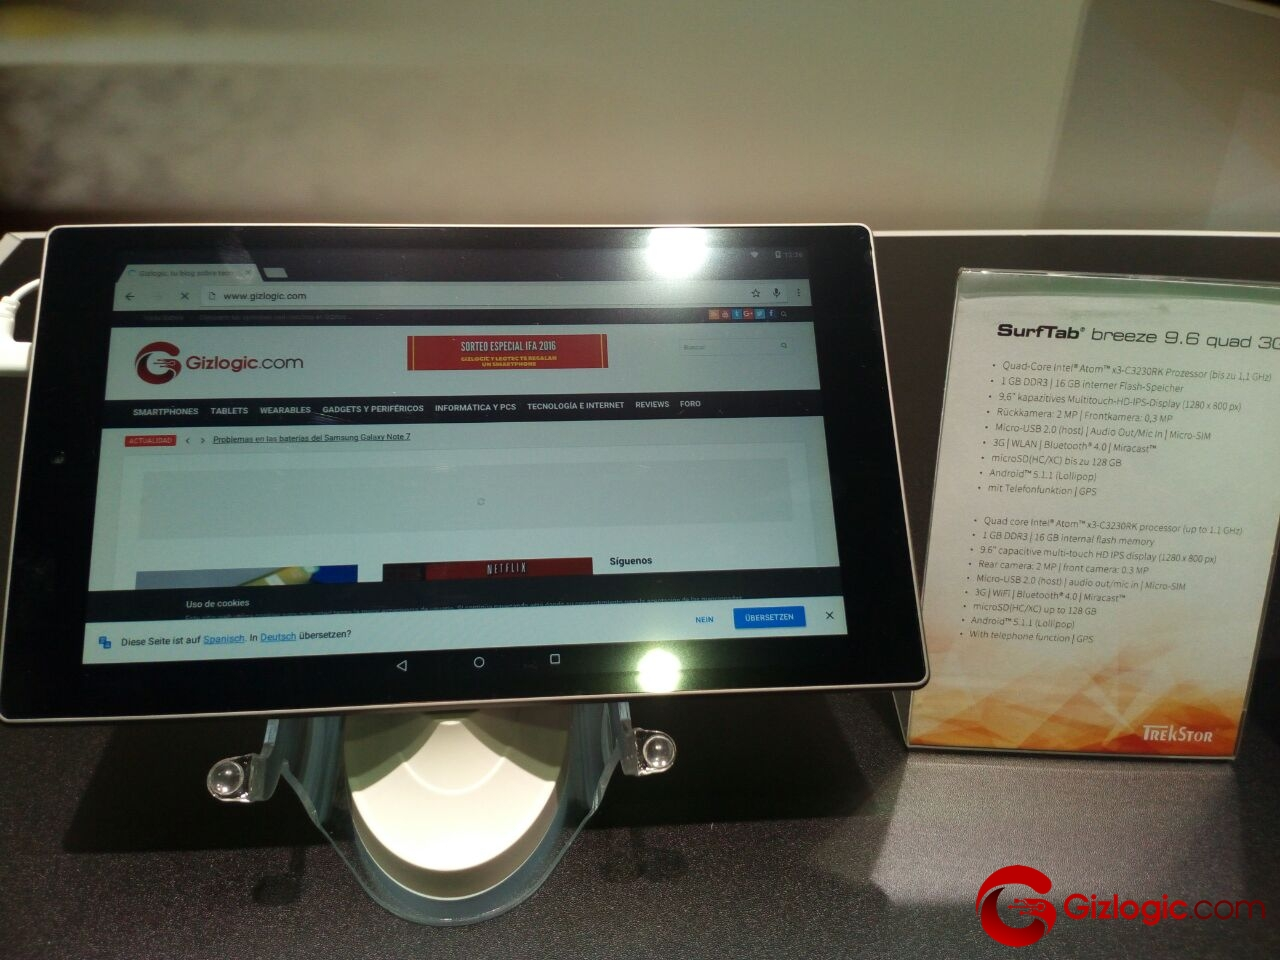 SurfTab Breeze 9.6 3G